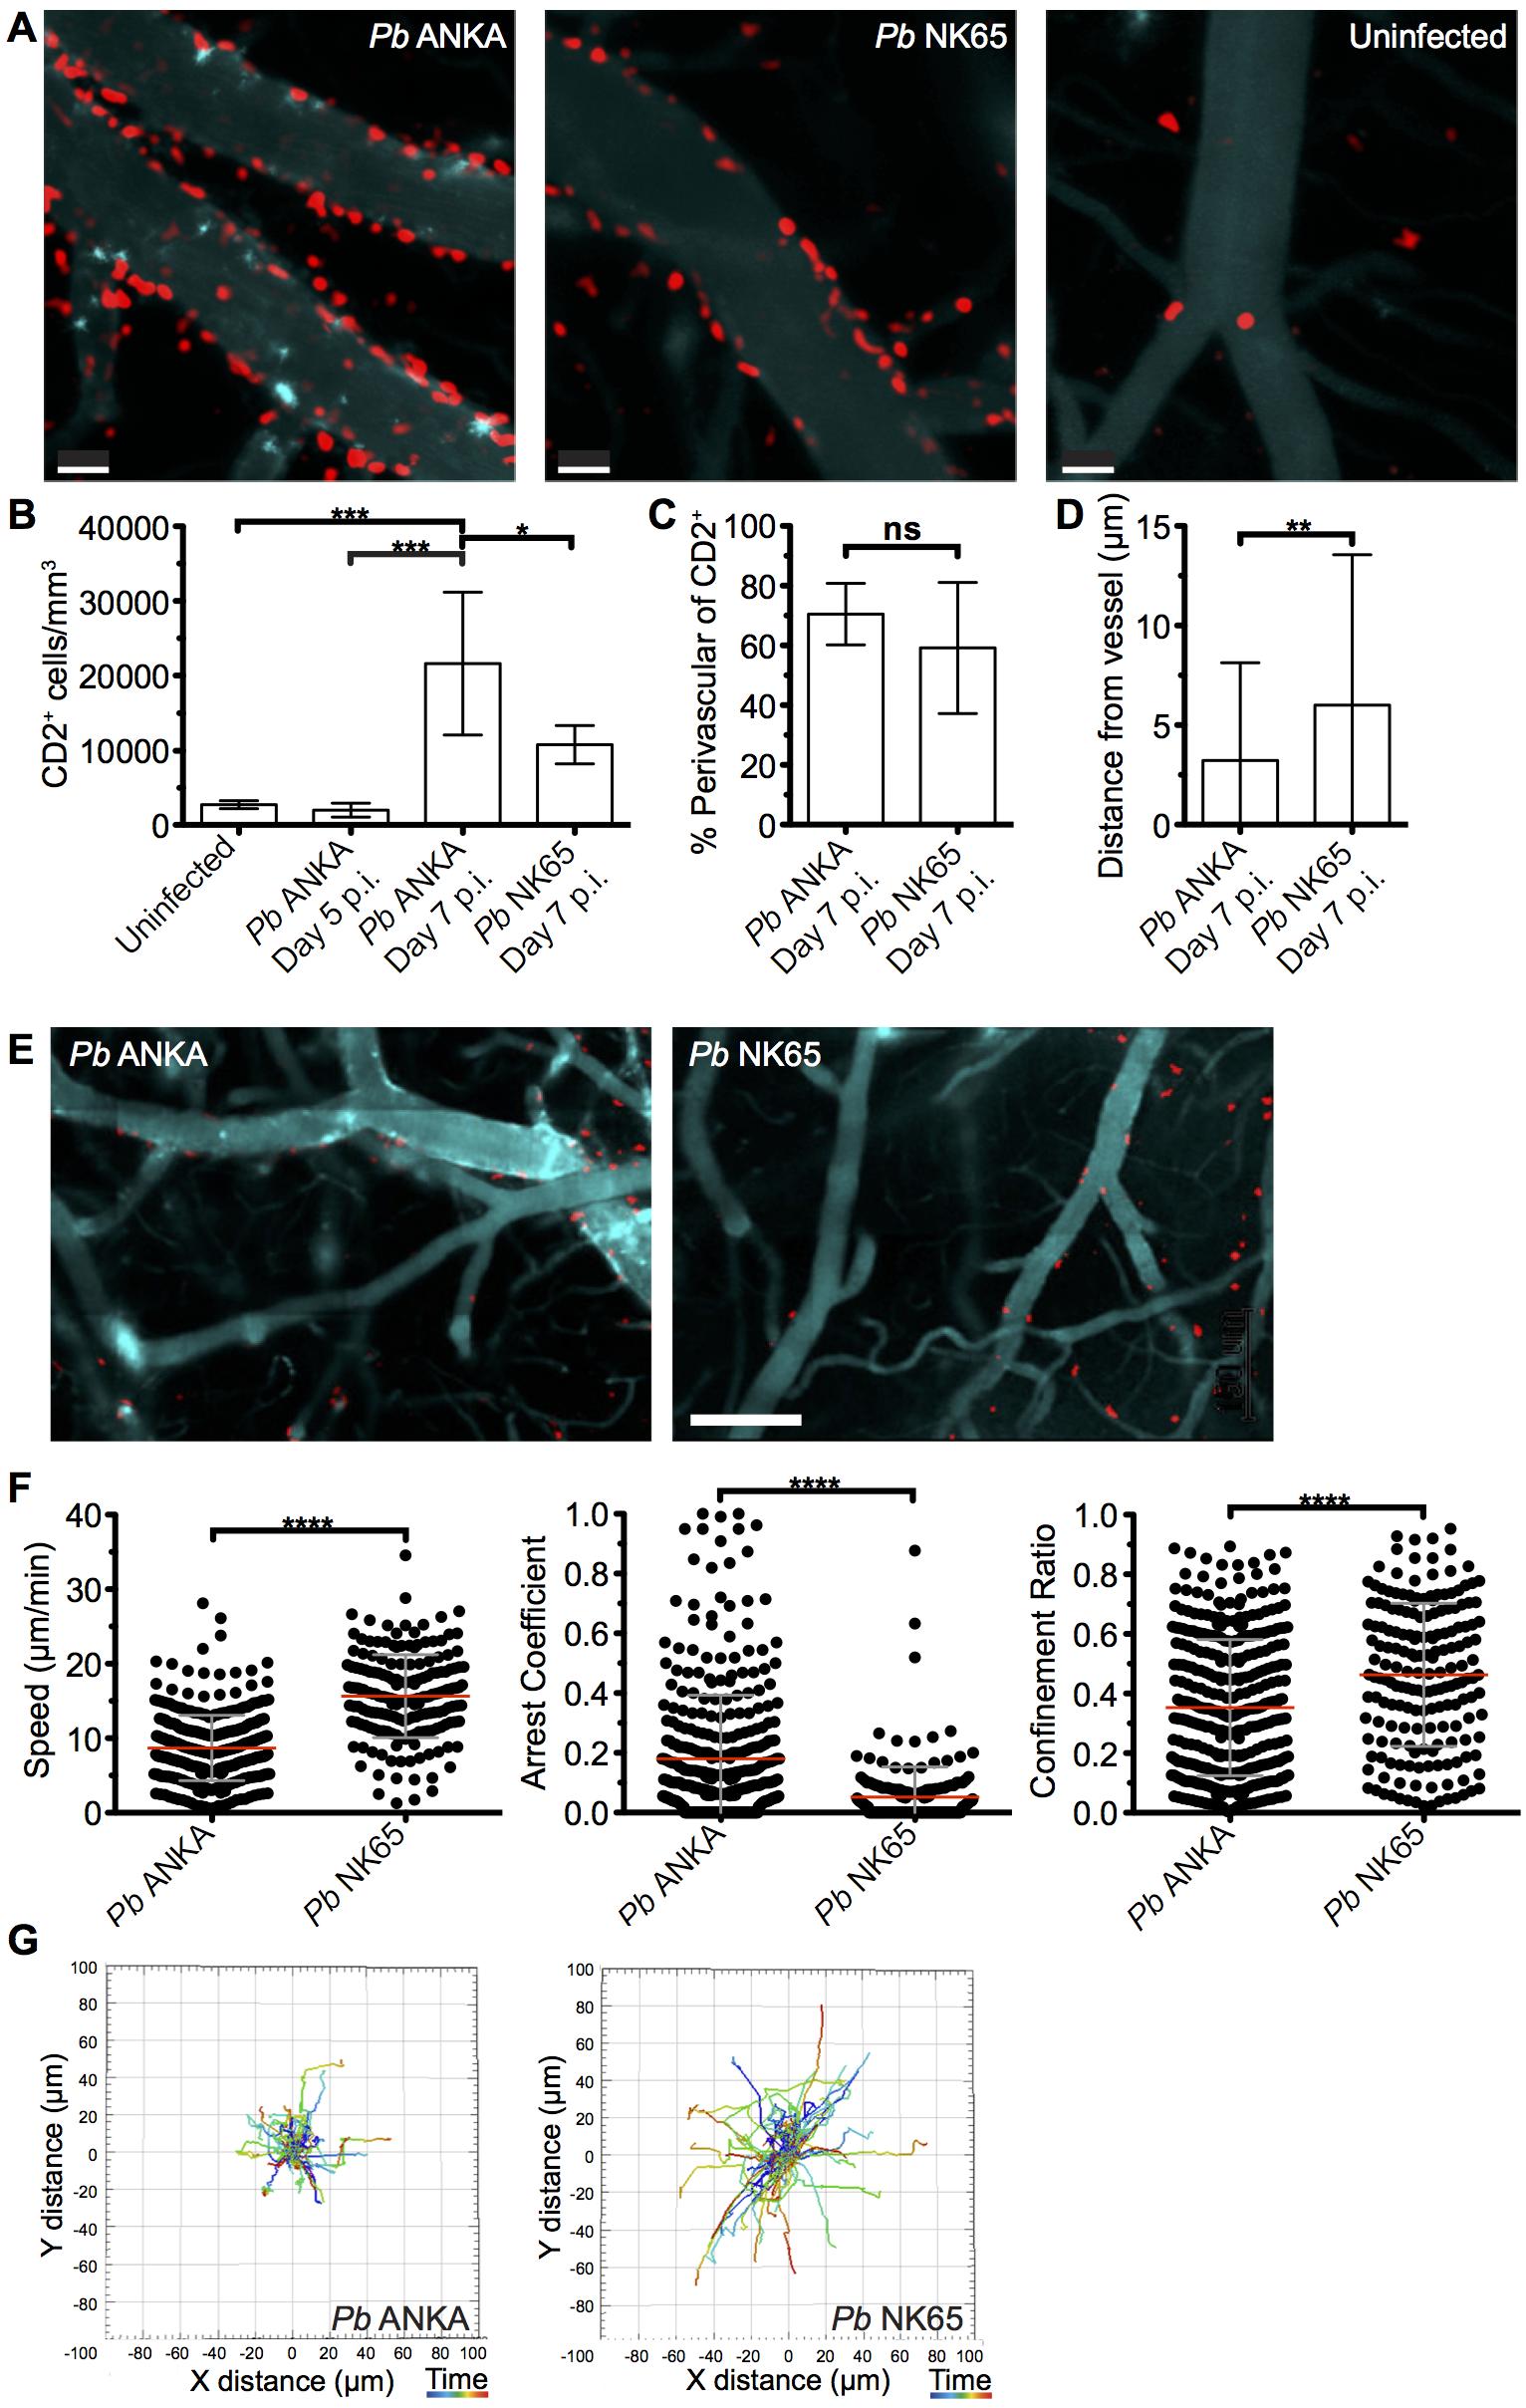 T cells exhibit equivalent perivascular compartmentalisation but distinct behaviours during <i>Pb</i> ANKA and <i>Pb</i> NK65 infections.